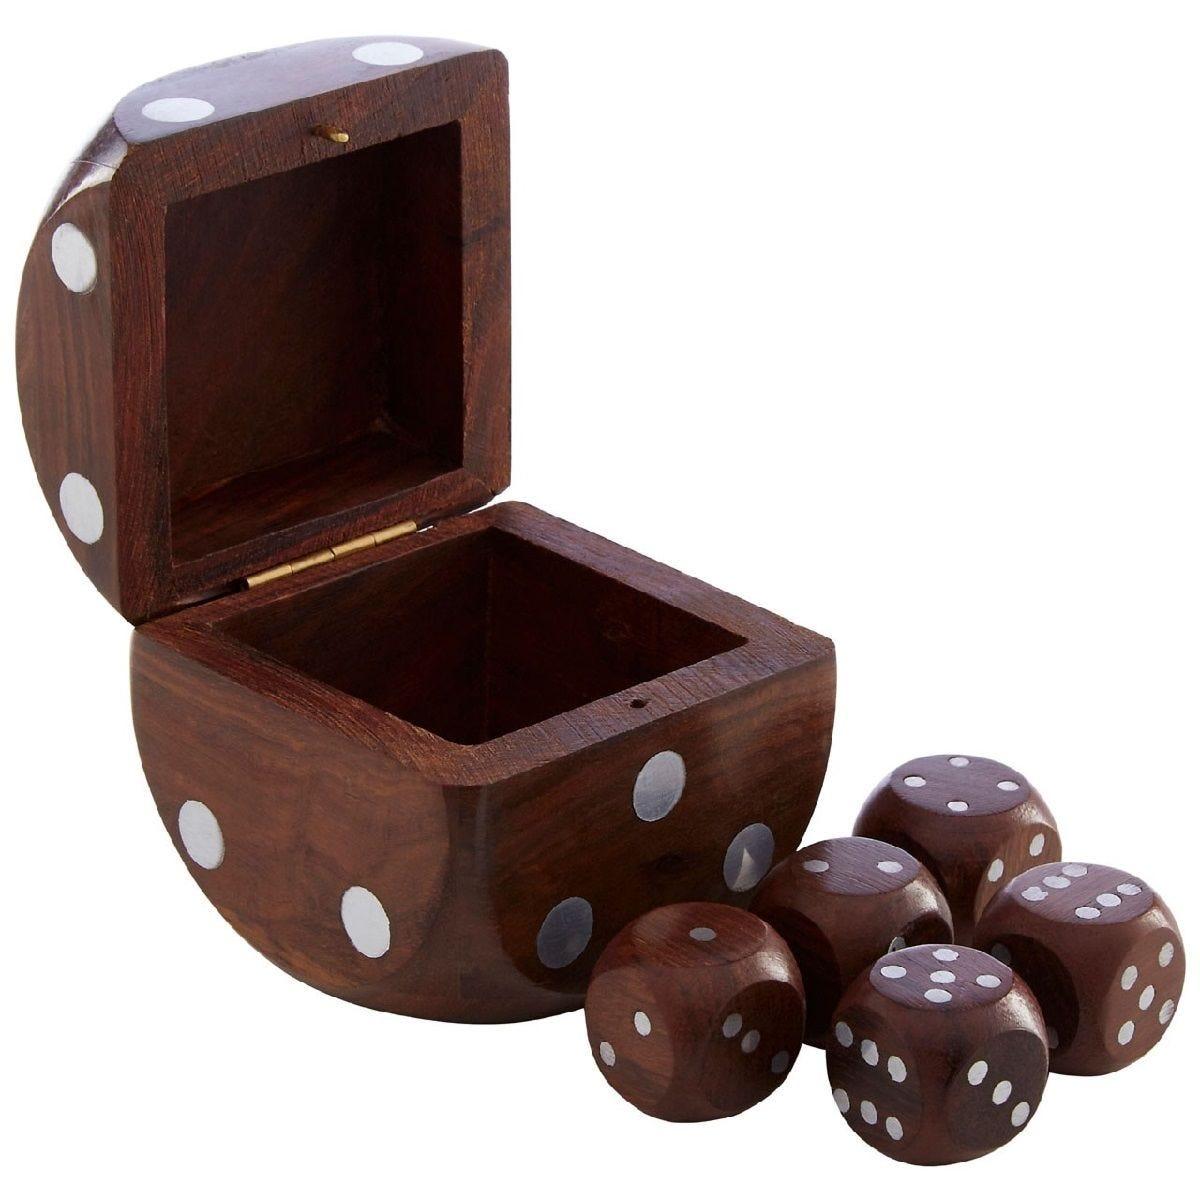 Premier Churchill Dice Box With 5 Dice - Sheesham Wood